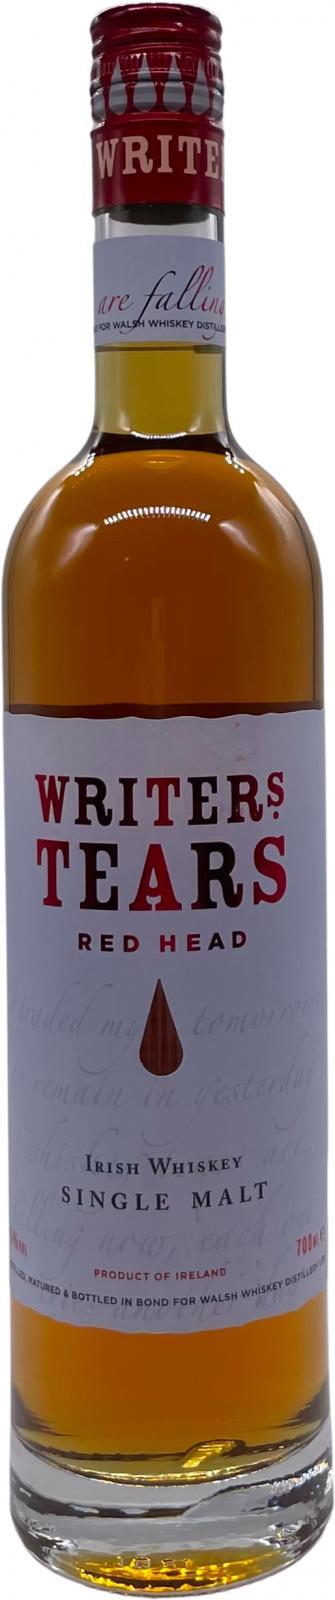 Writer's Tears Red Head